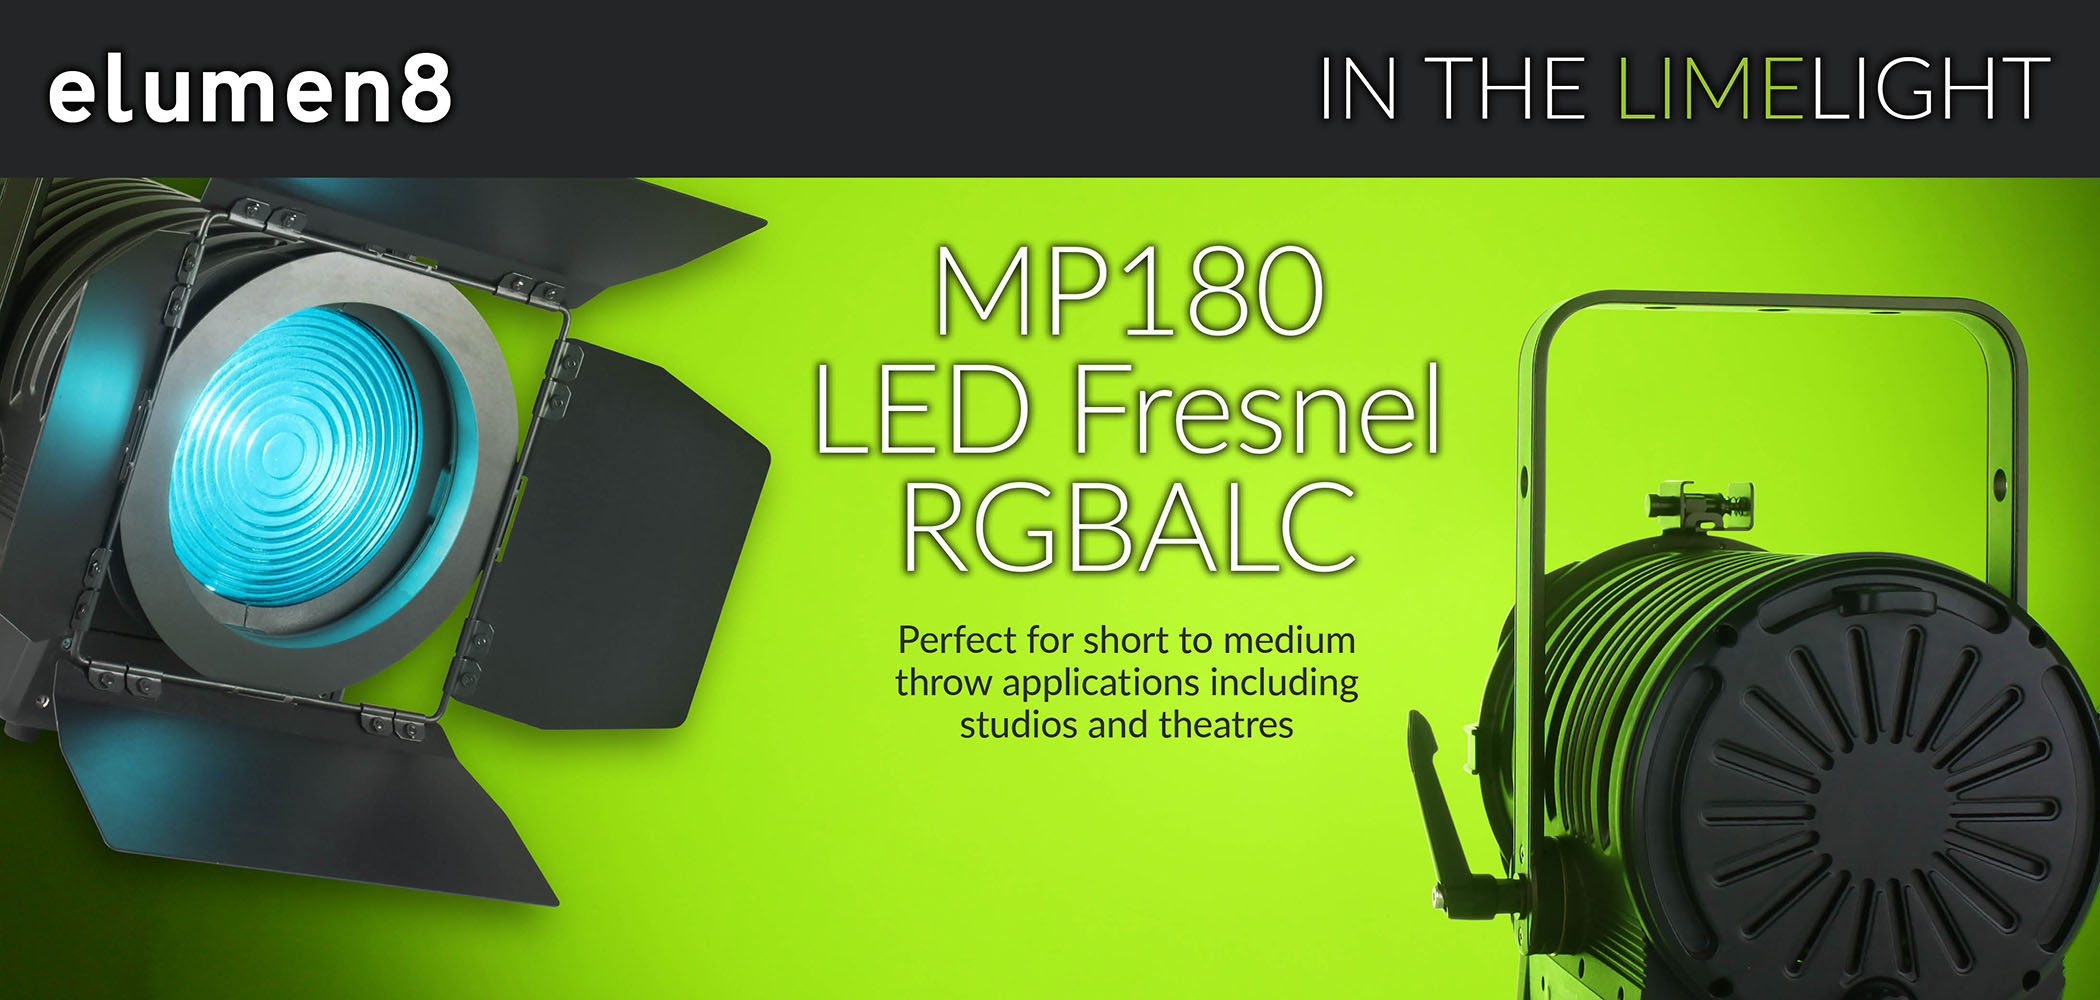 MP180 LED Fresnel RGBALC